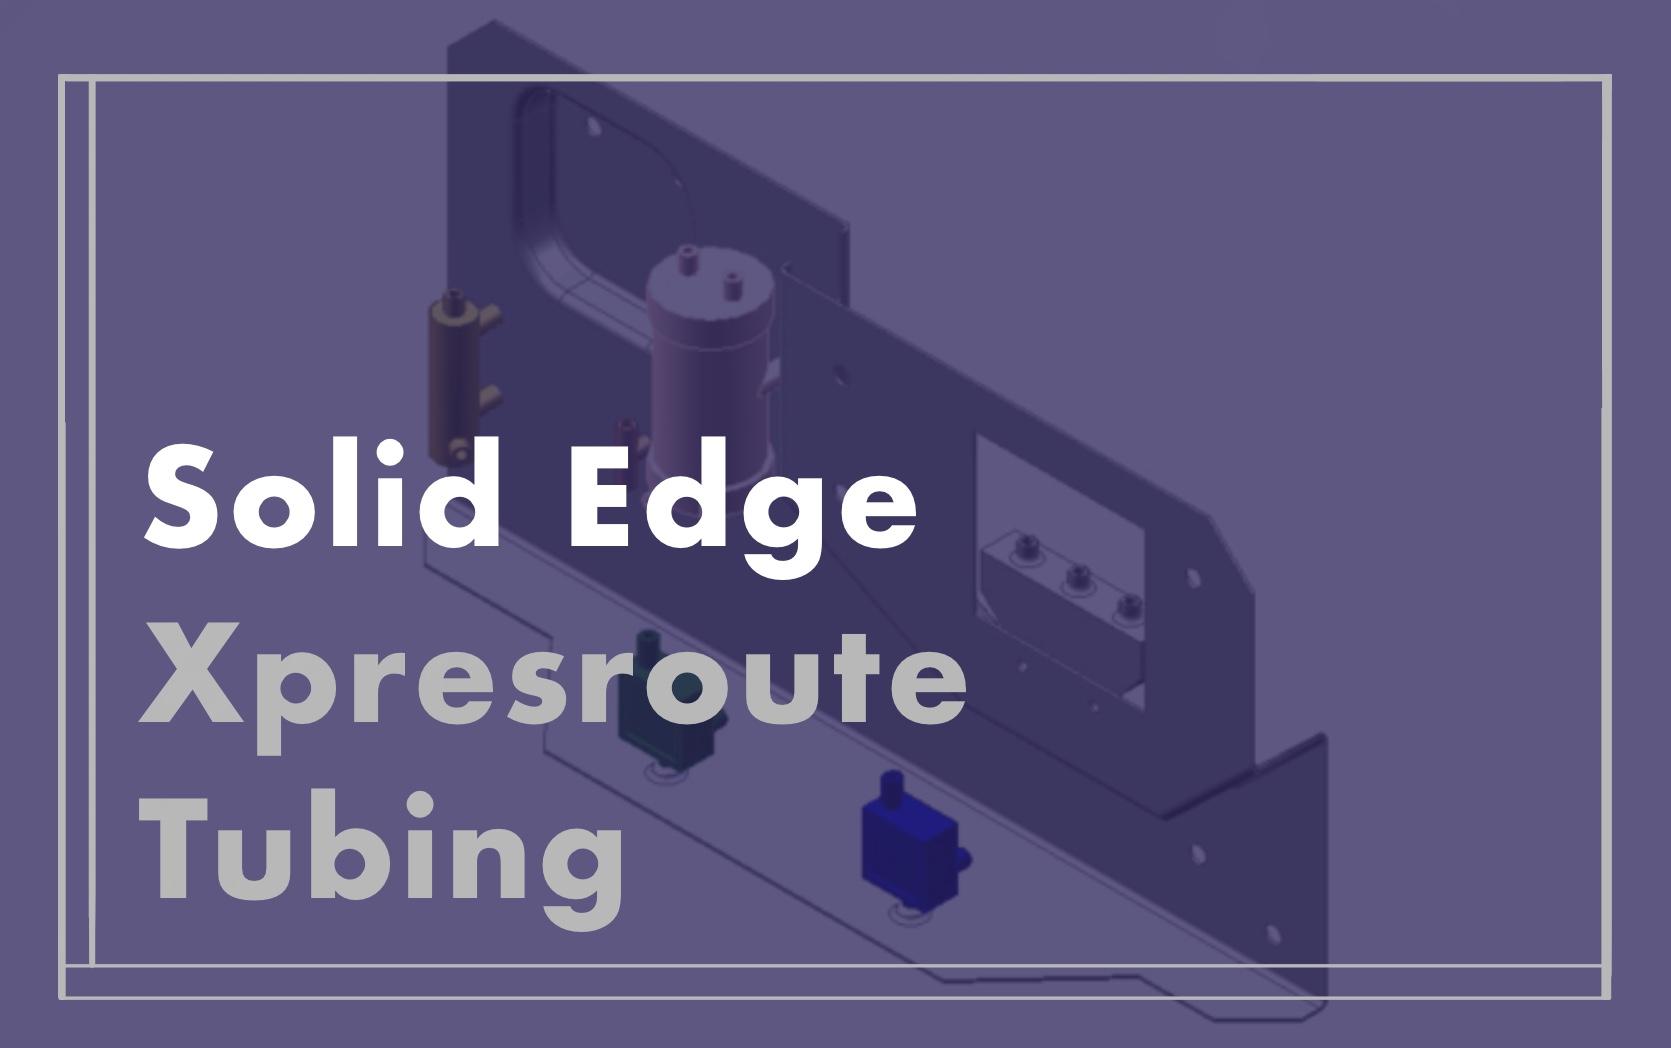 Solid Edge XpresRoute Tubing